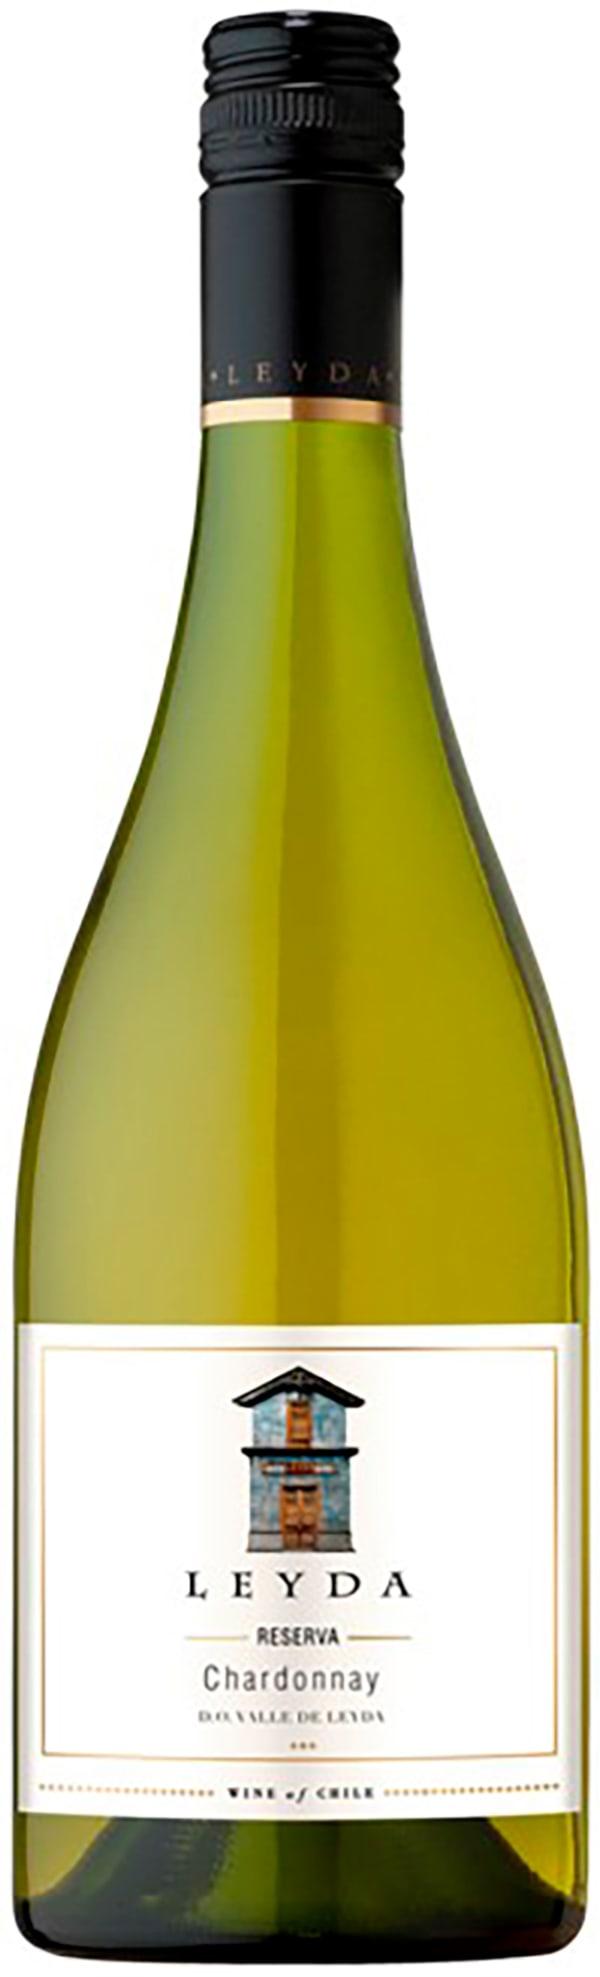 Leyda Reserva Chardonnay 2020